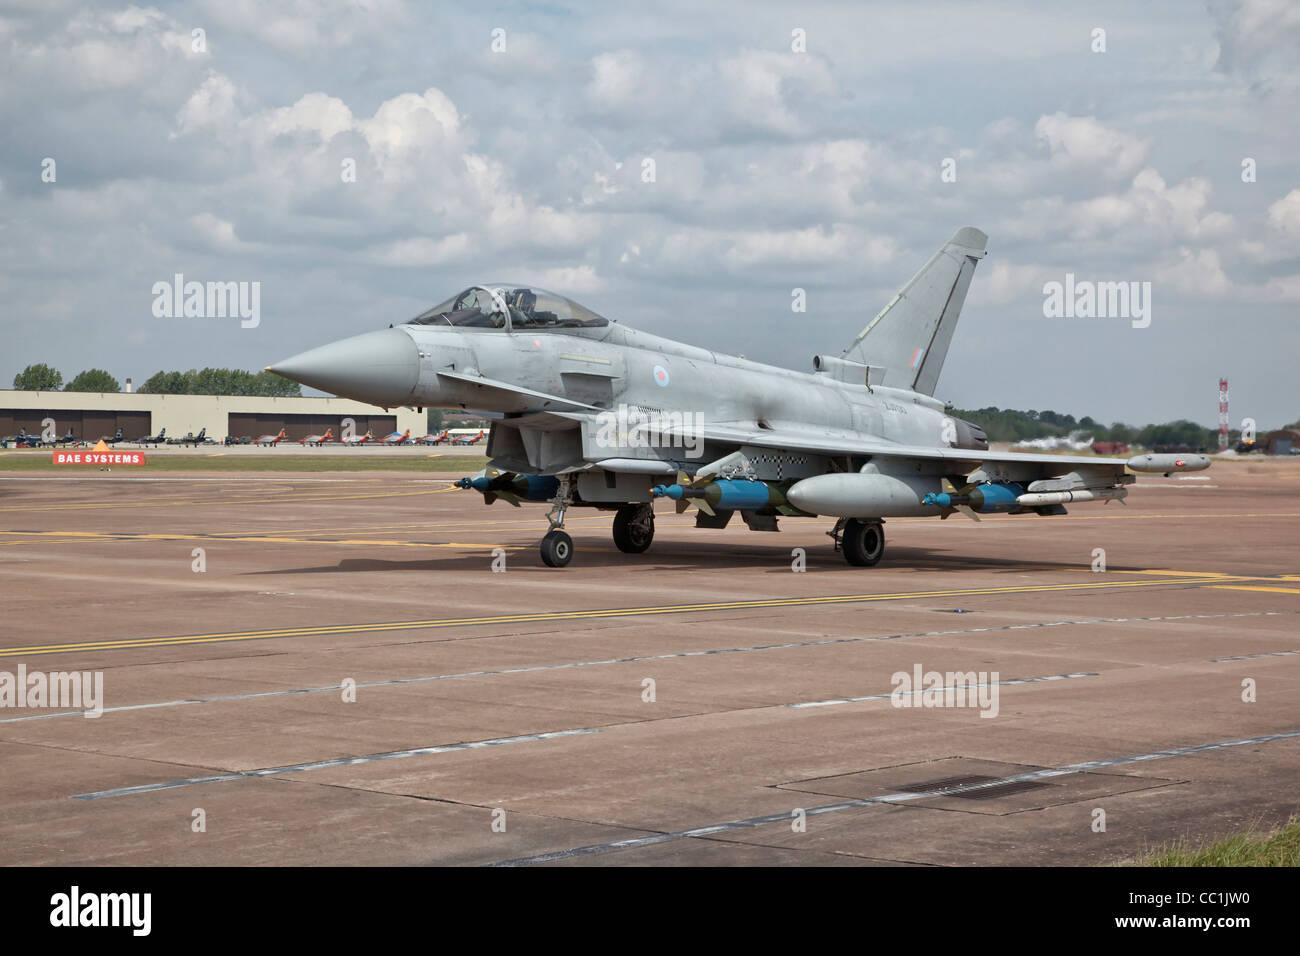 Bae Systems Typhoon - Stock Image